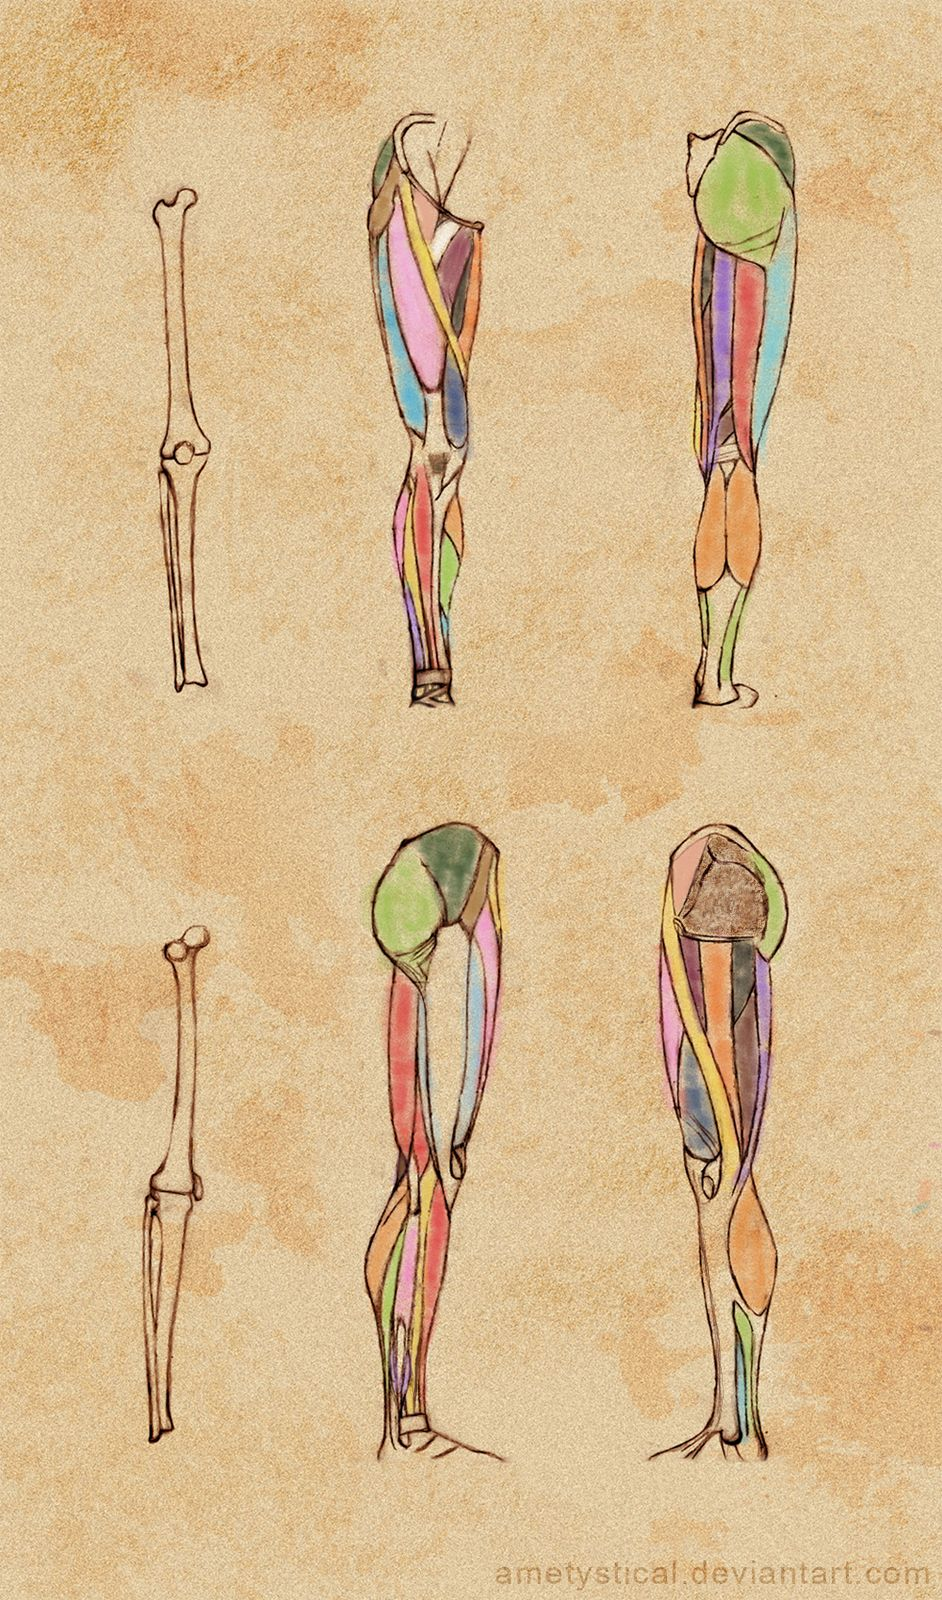 Right) Leg Study by Ametystical.deviantart.com on @DeviantArt ...